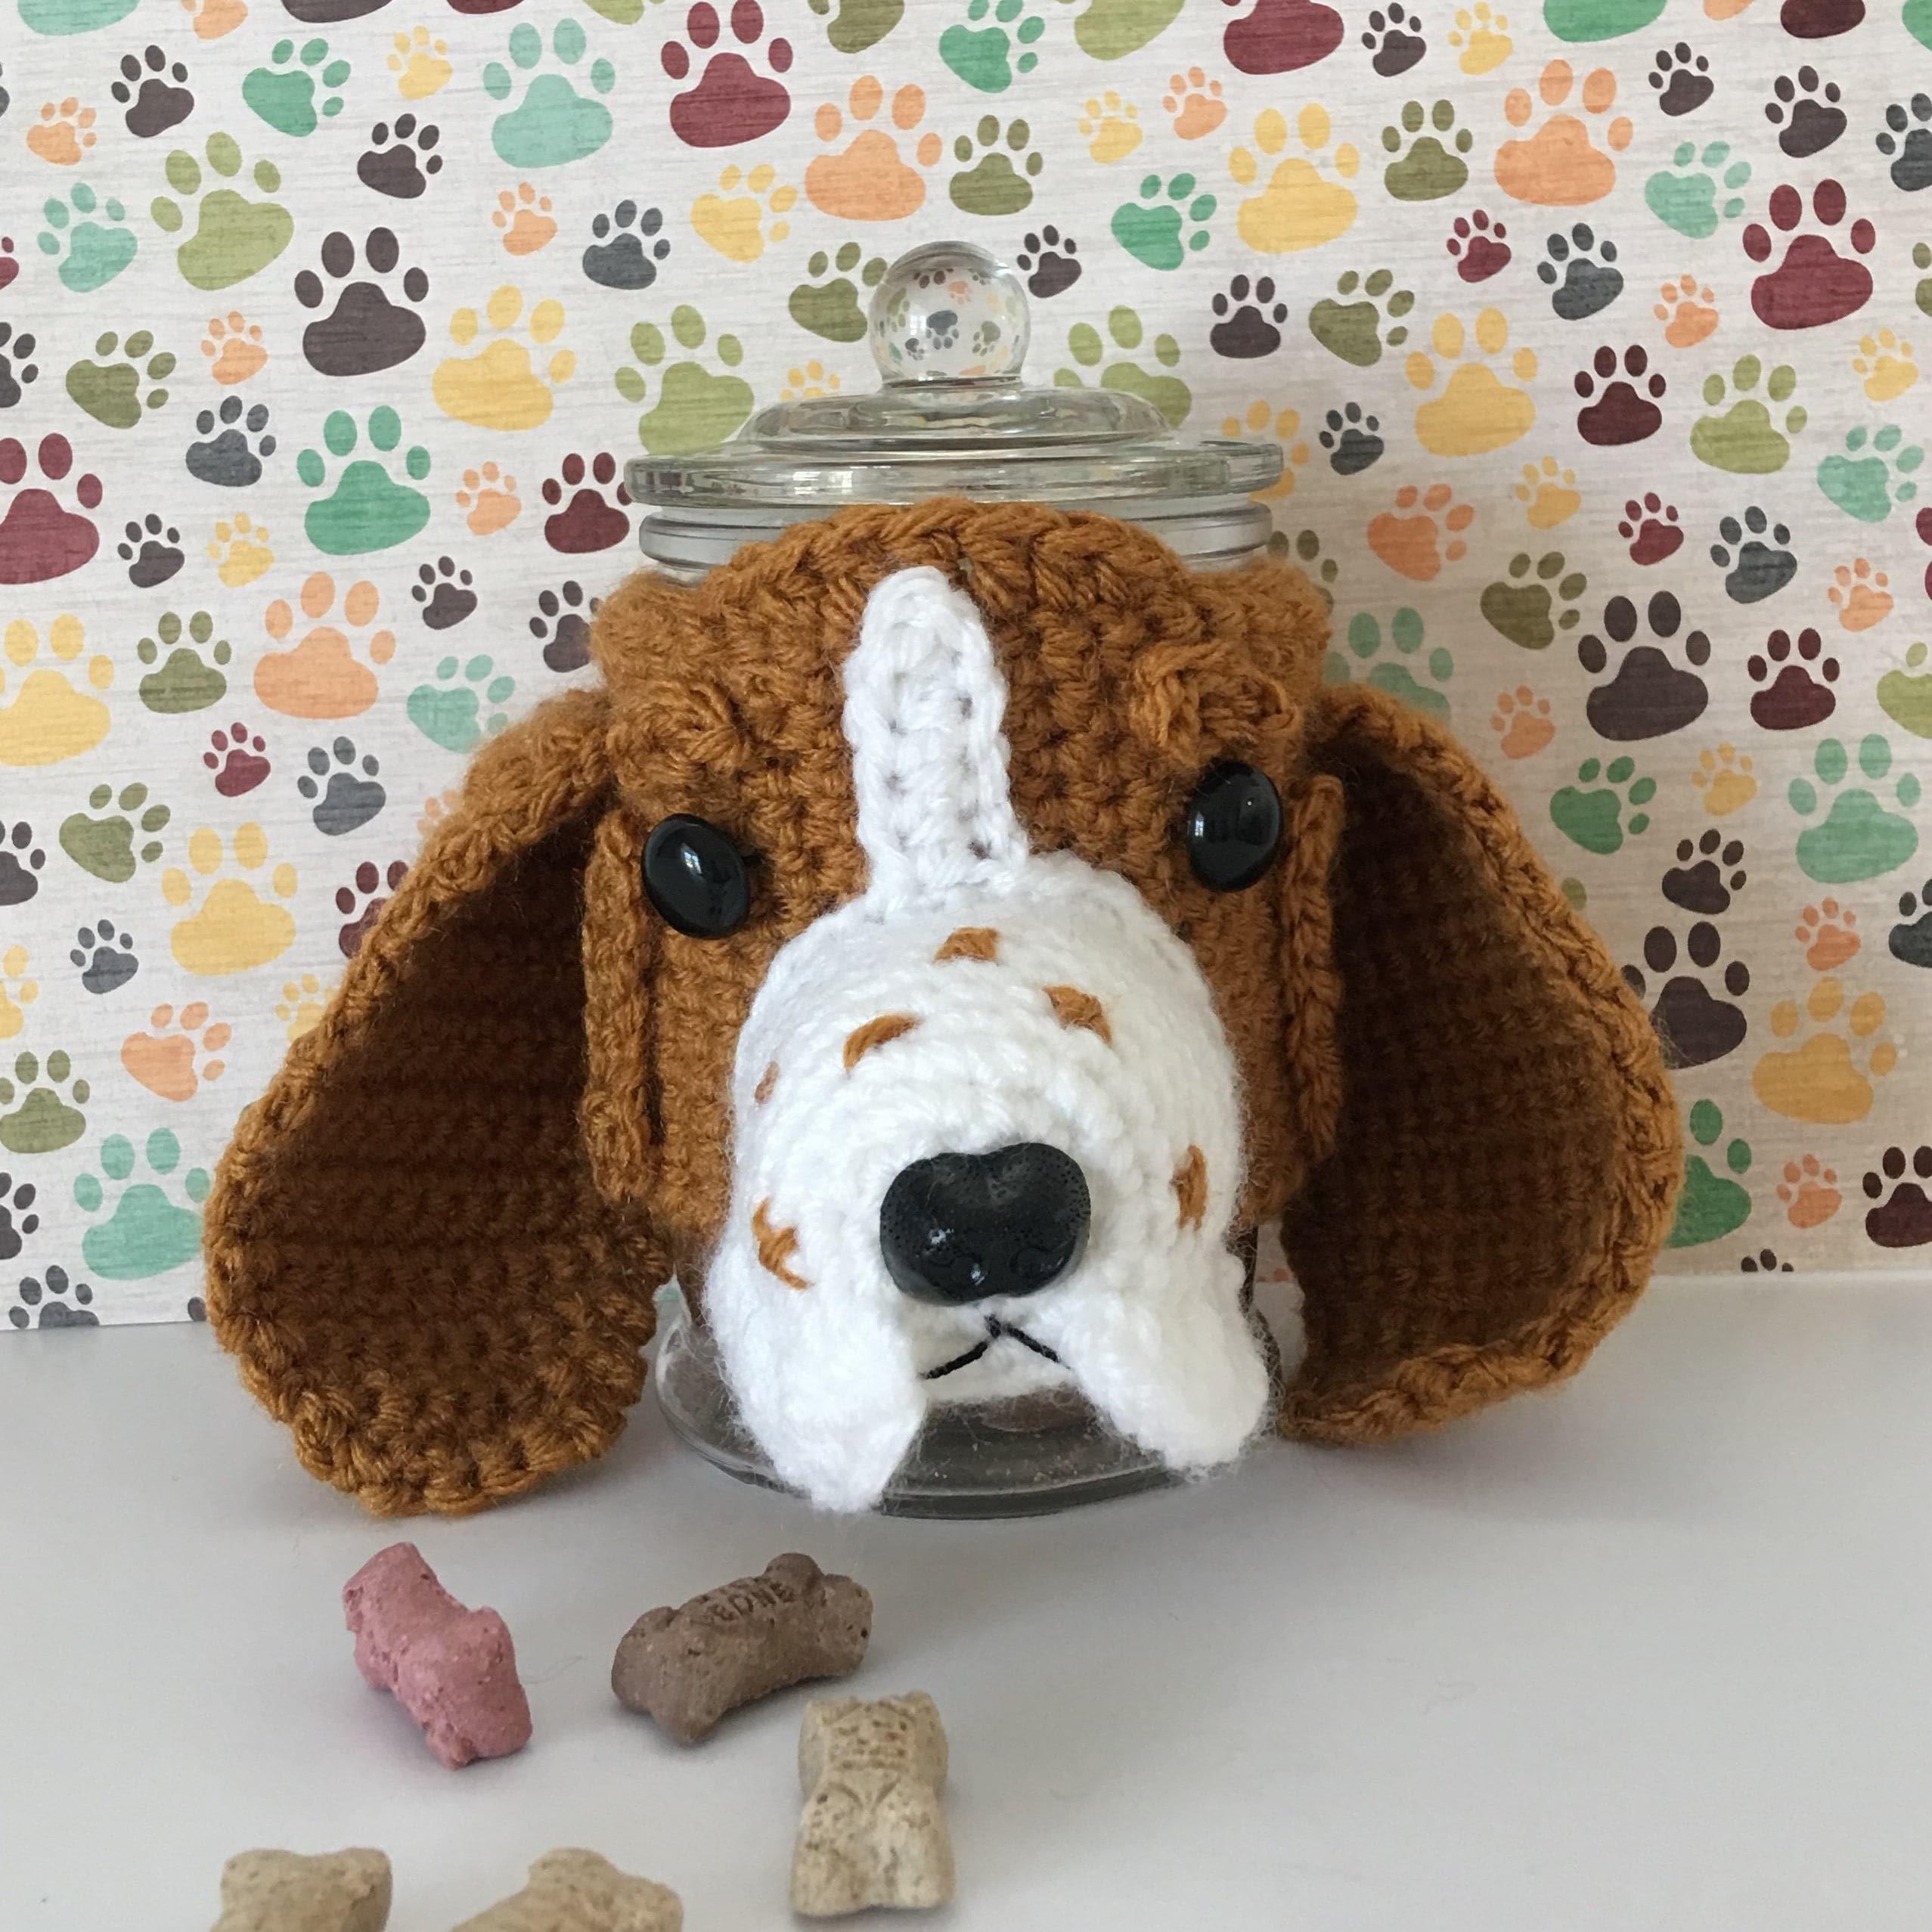 Crochet Pattern - Crocket Kit - Amigurumi Kit - Crochet ...